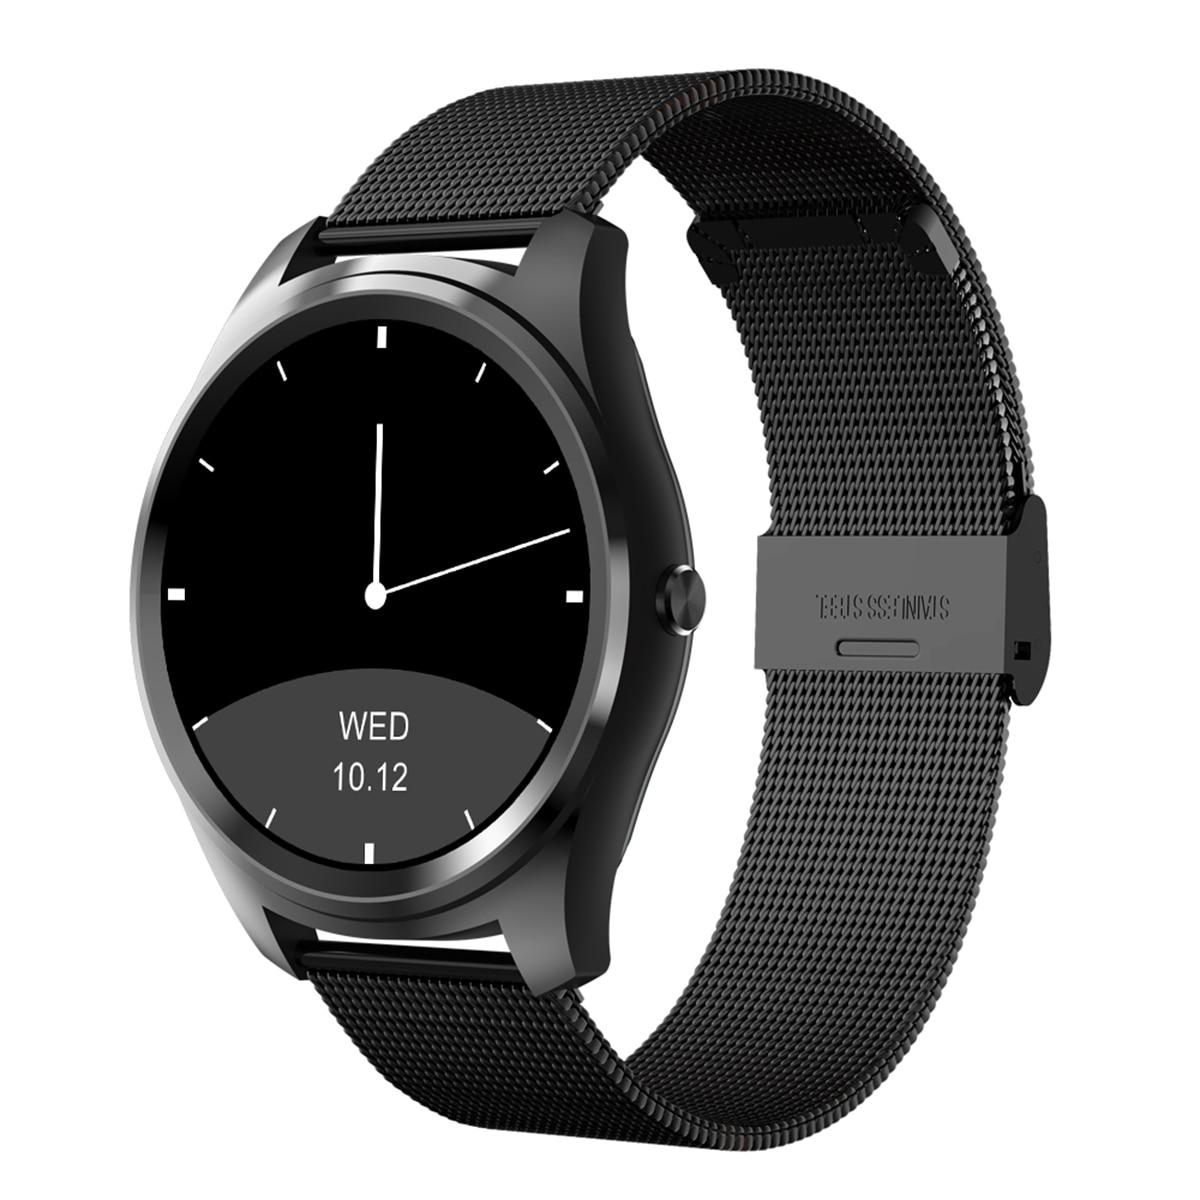 Diggro DI03 Smart watch MTK2502C Heart Rate Monitor Pedometer Sedentary Remind Sleep Monitor Notifications Pushing